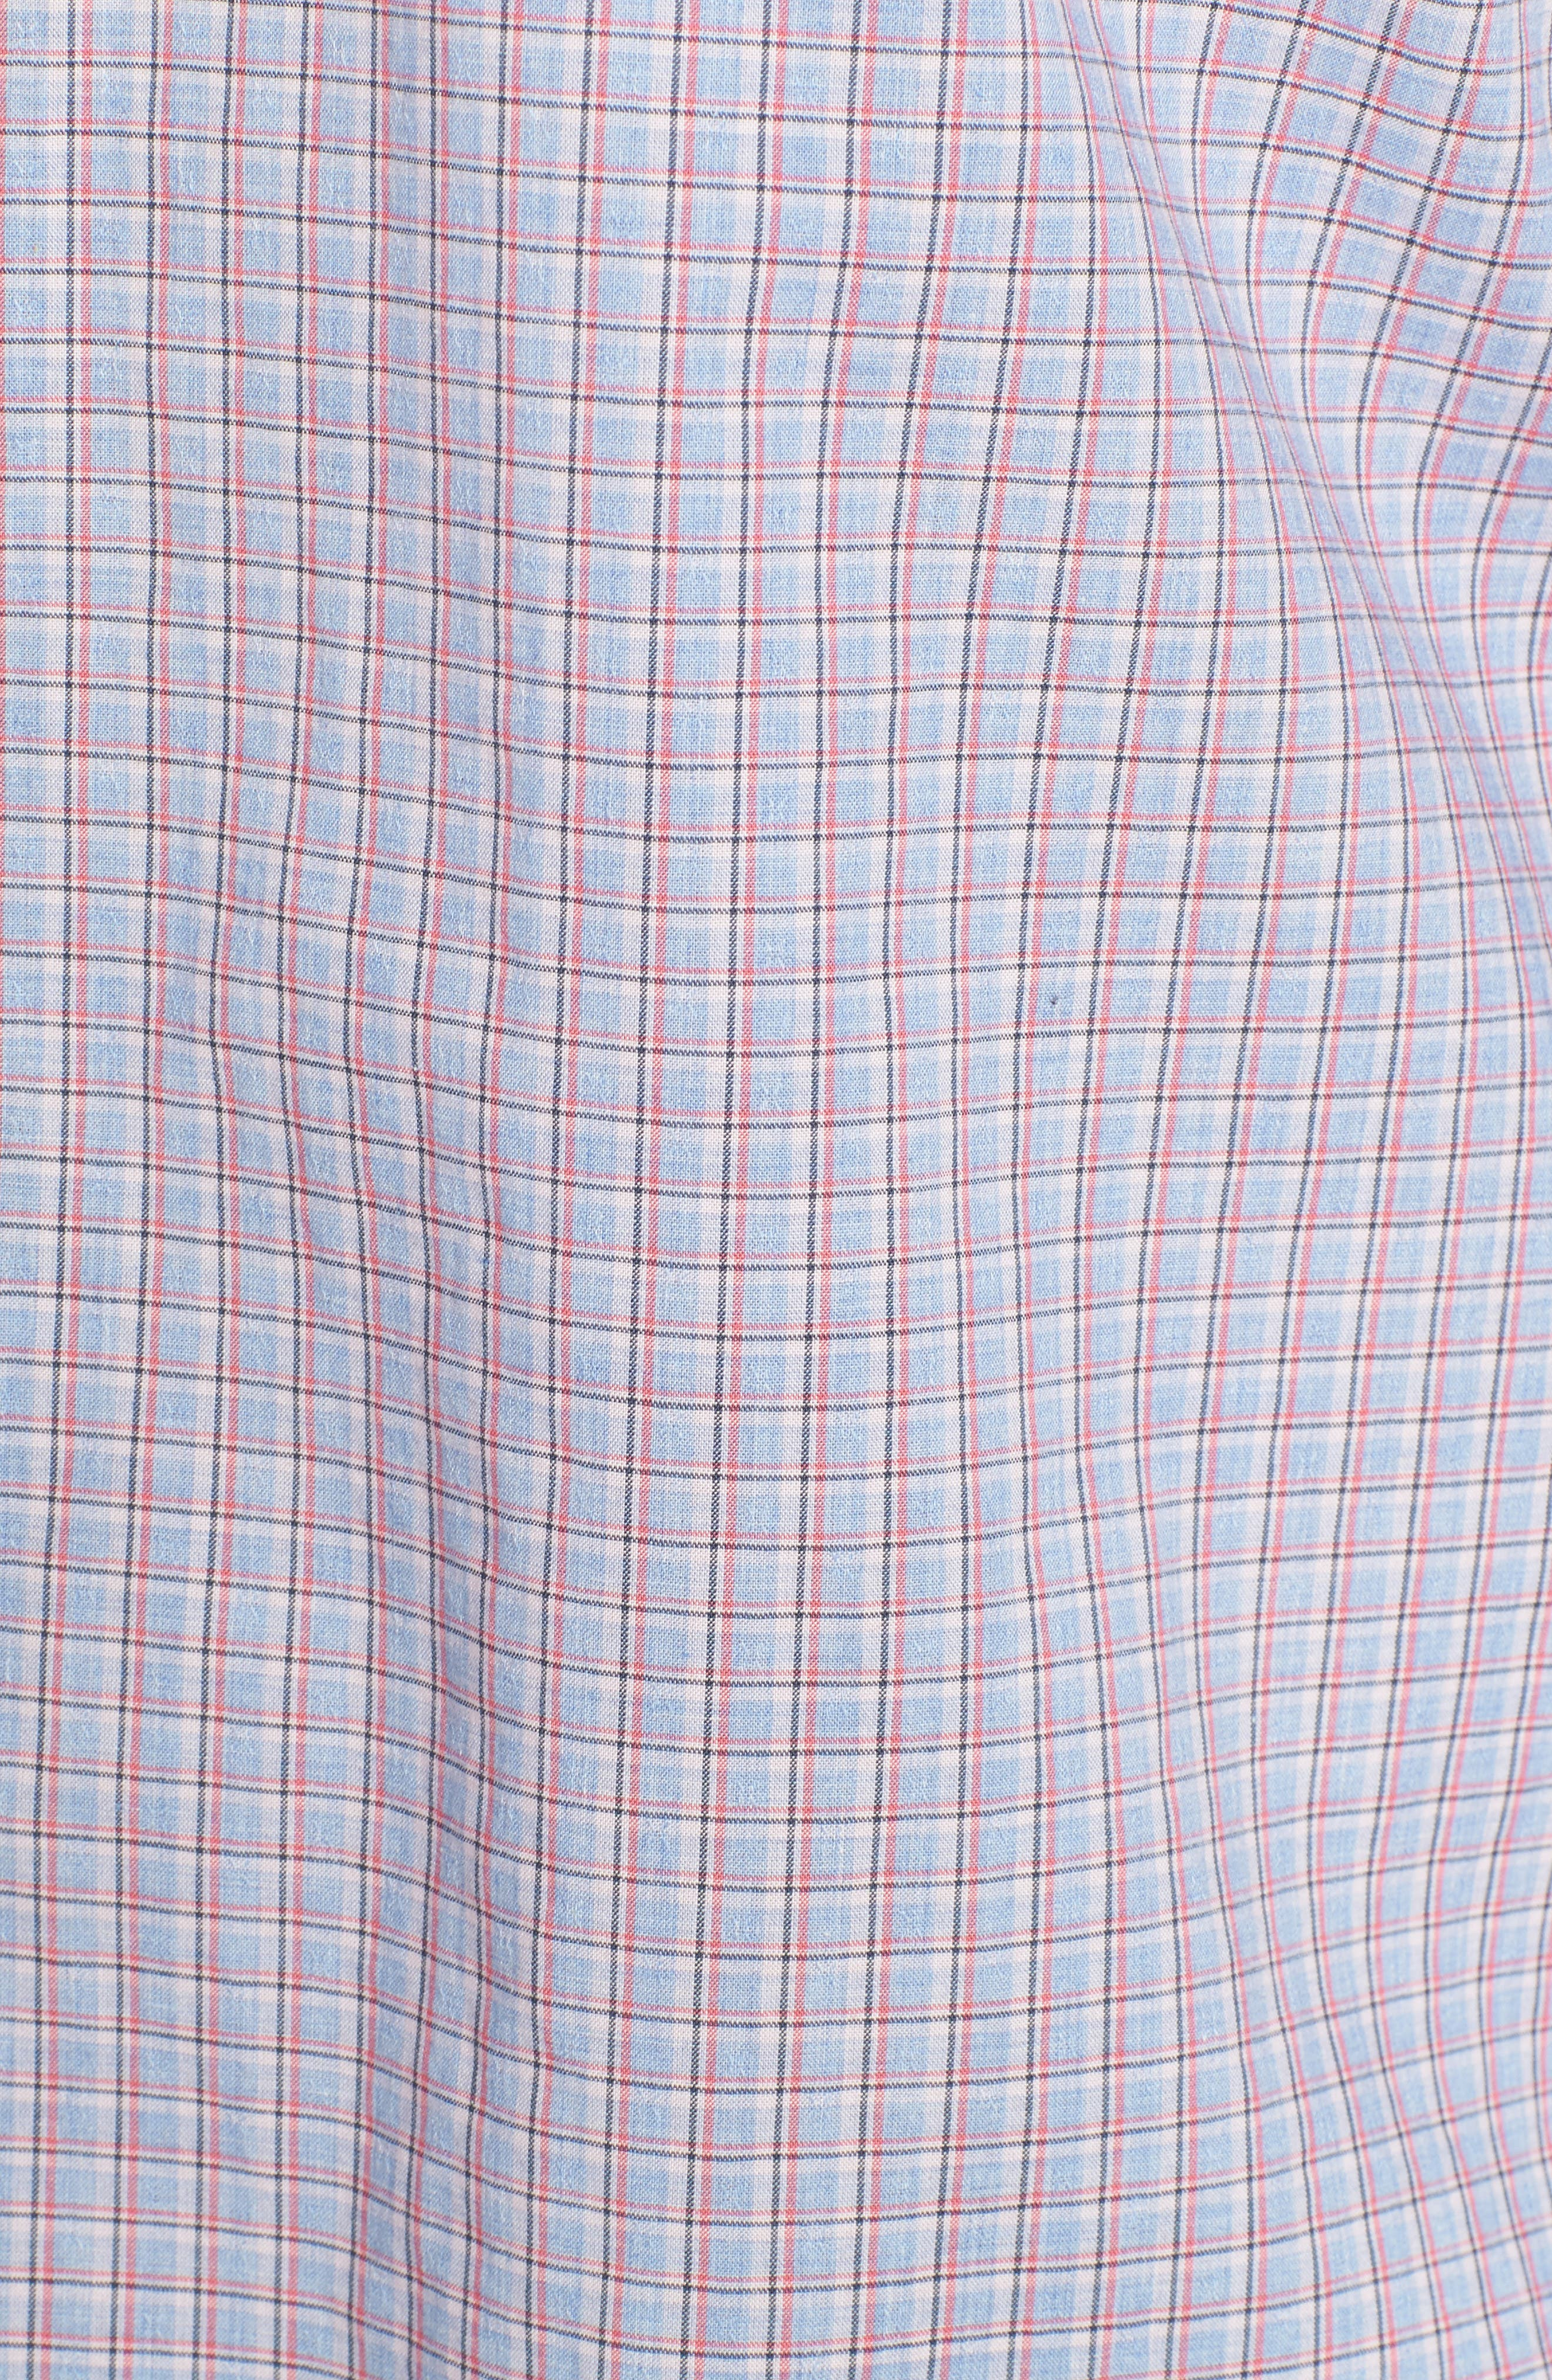 Drozdov Plaid Sport Shirt,                             Alternate thumbnail 5, color,                             650